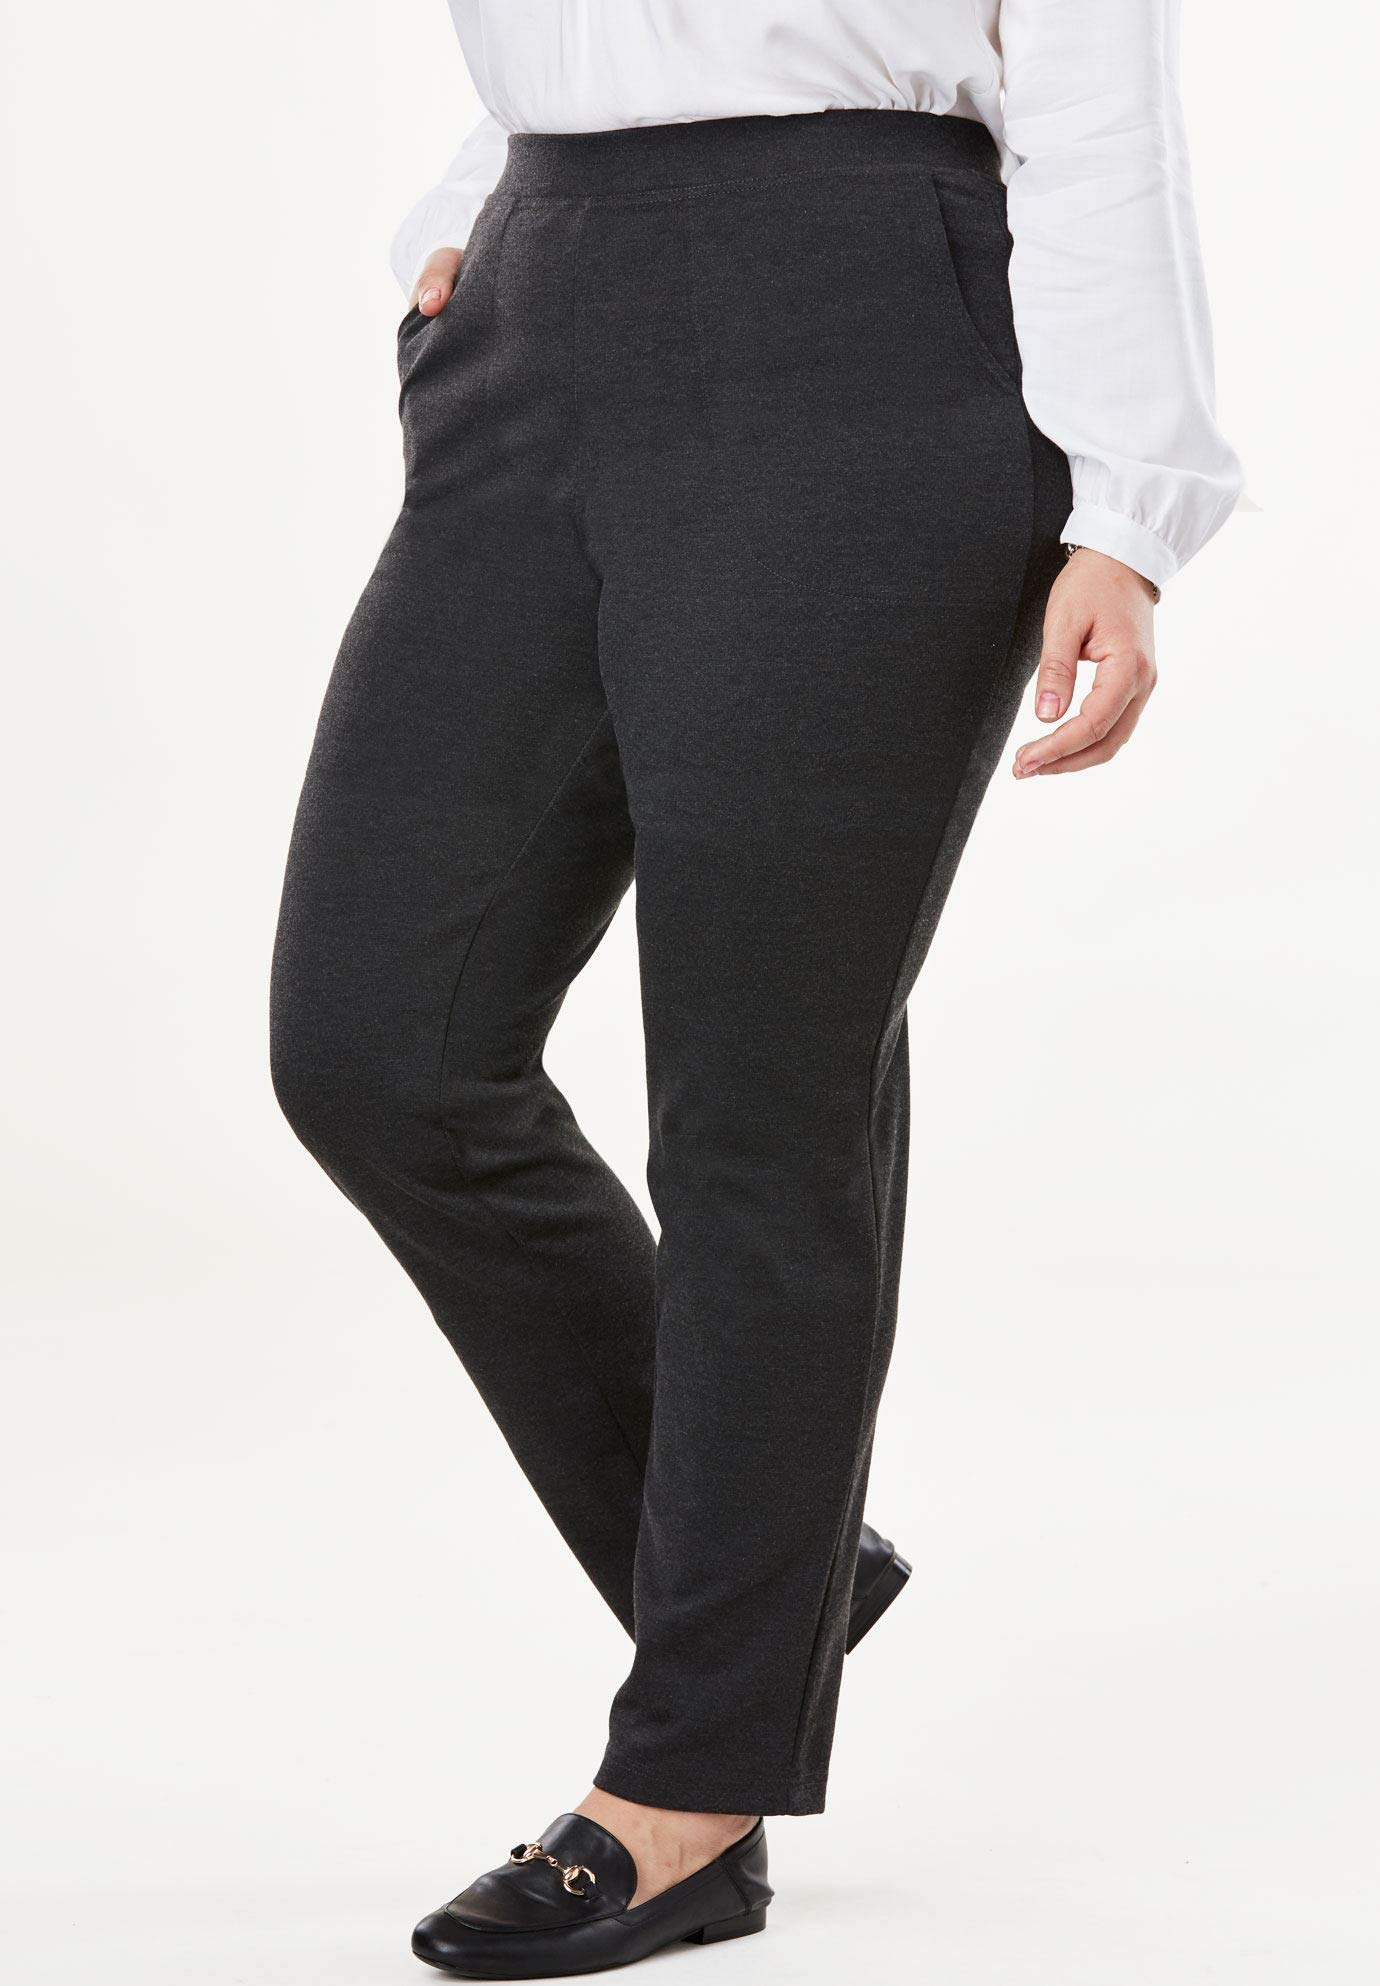 Women's Plus Size Petite Straight Leg Ponte Knit Pant